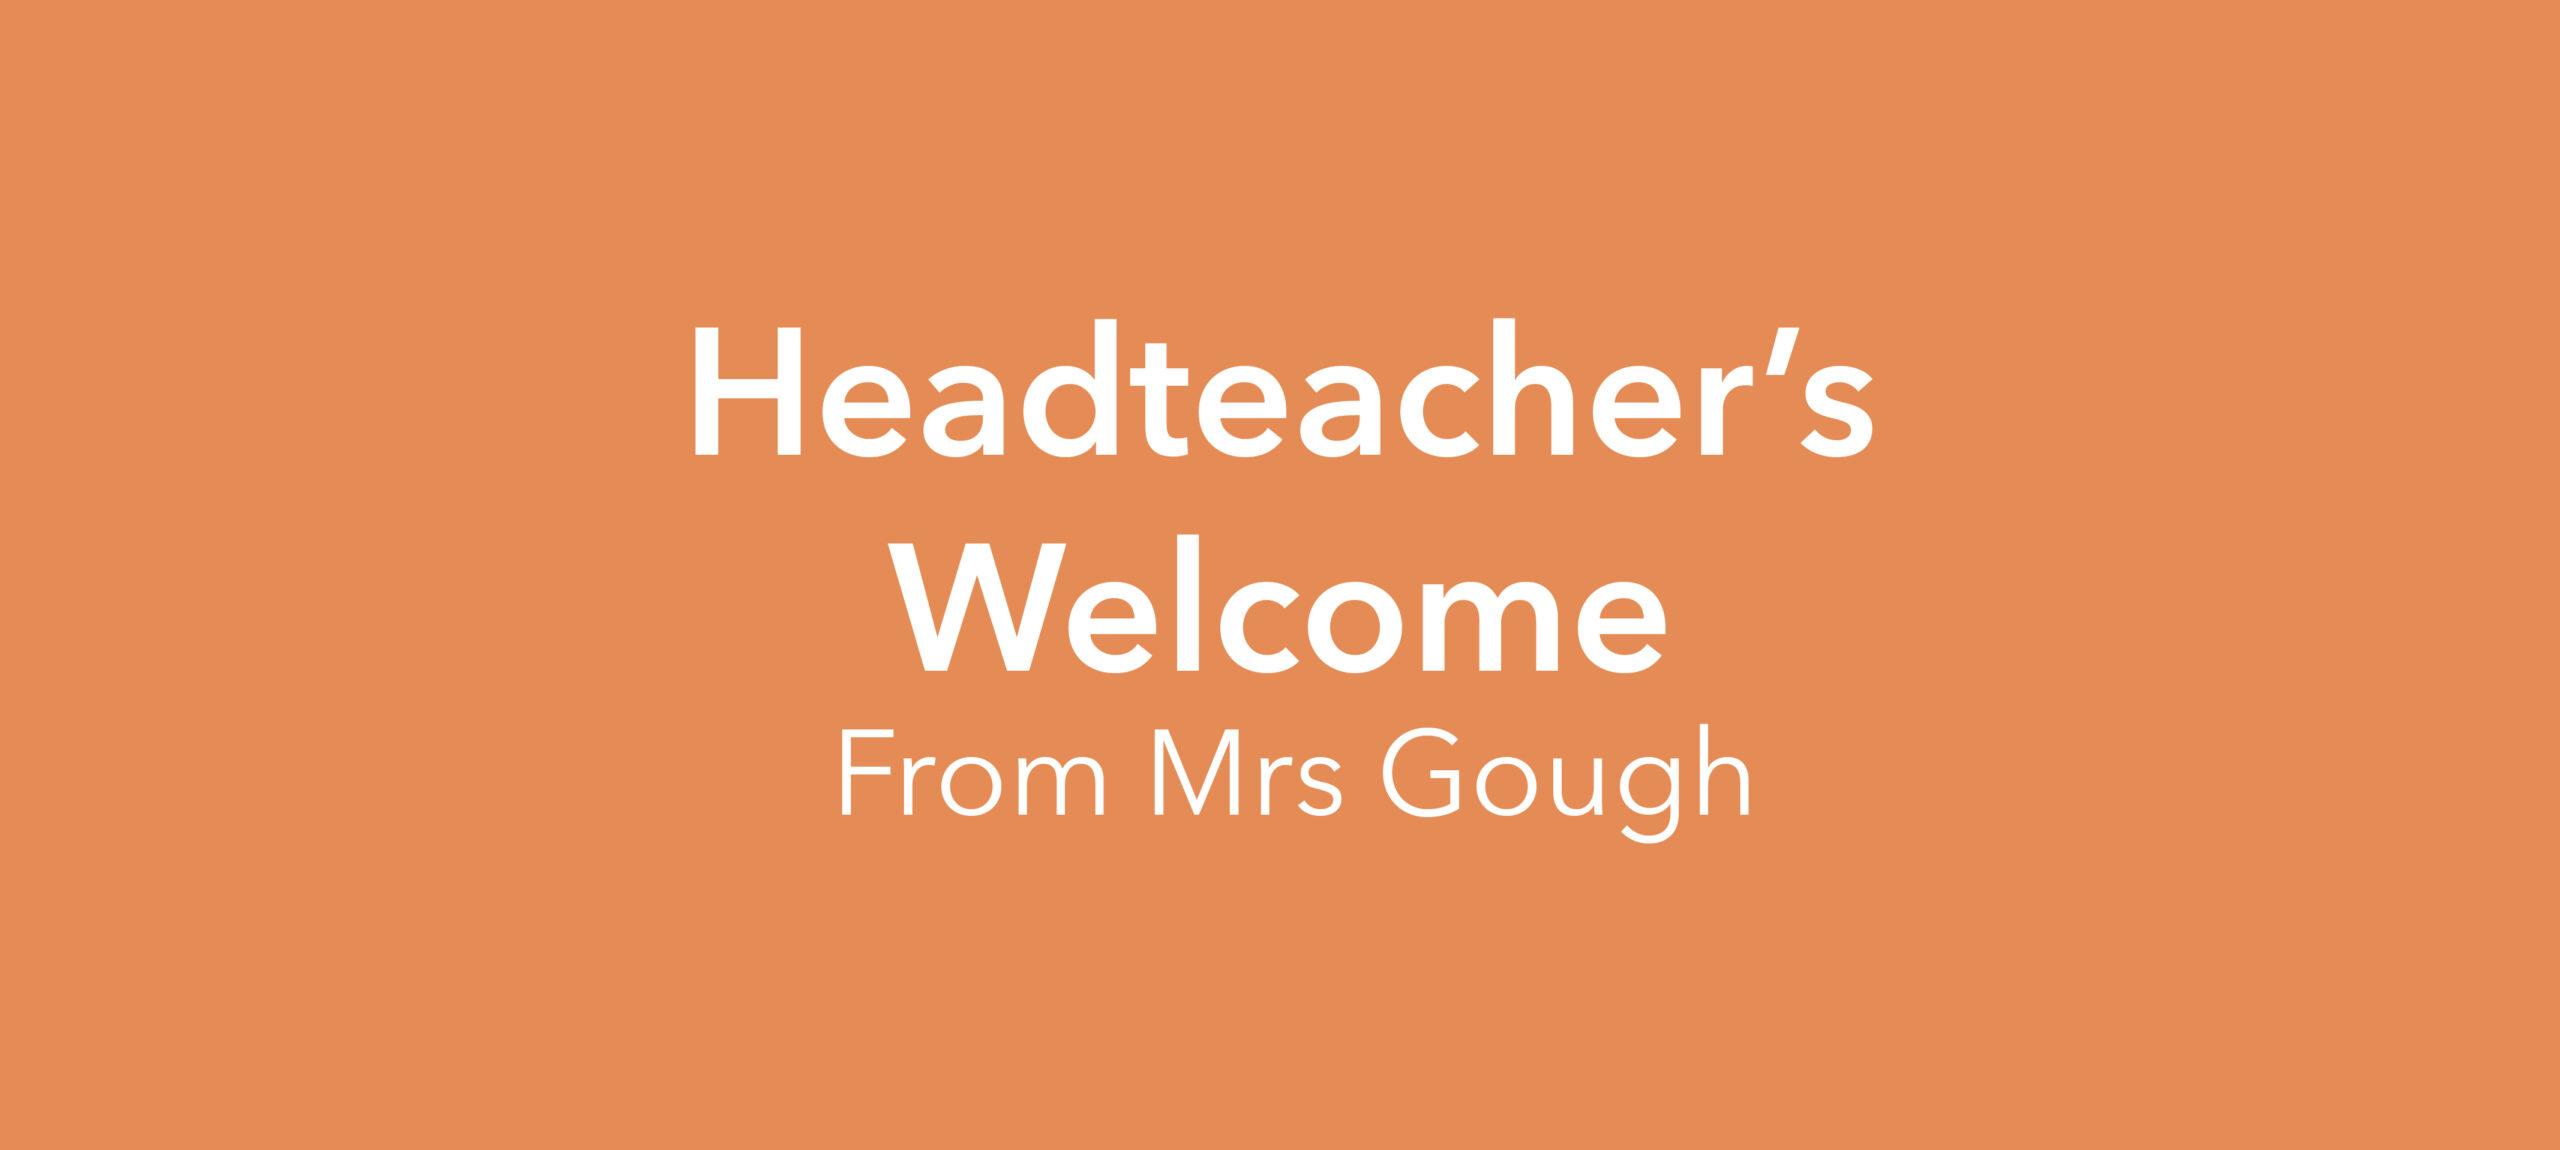 Headteacher's Welcome